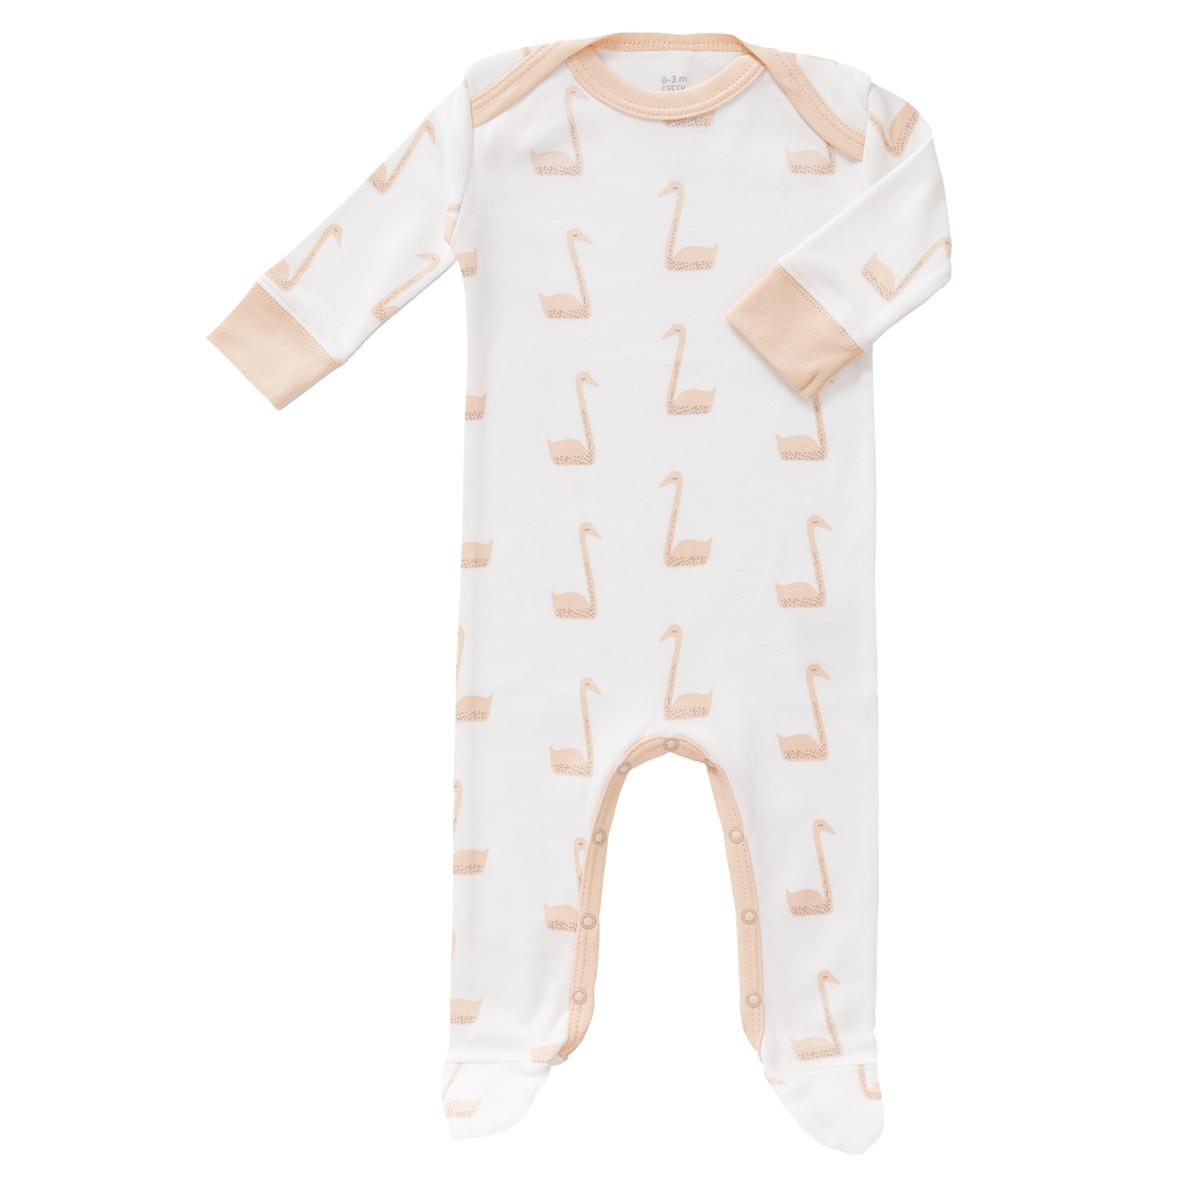 Body & Pyjama Pyjama Cygne - 6/12 Mois Pyjama Cygne - 6/12 Mois